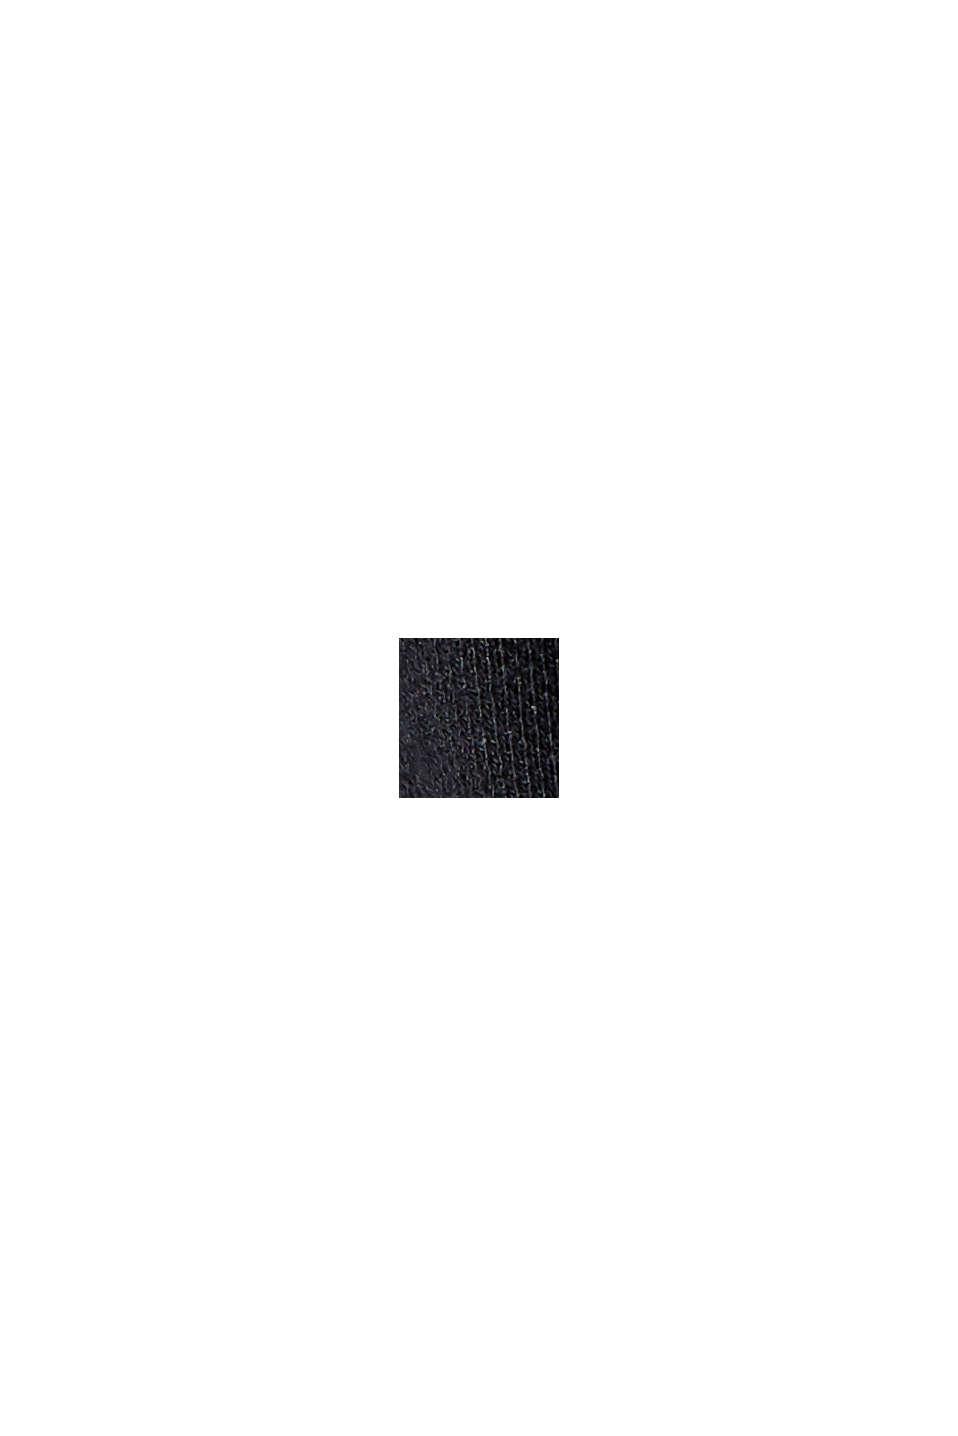 TENNIS piké polokošile s bio bavlnou, BLACK, swatch